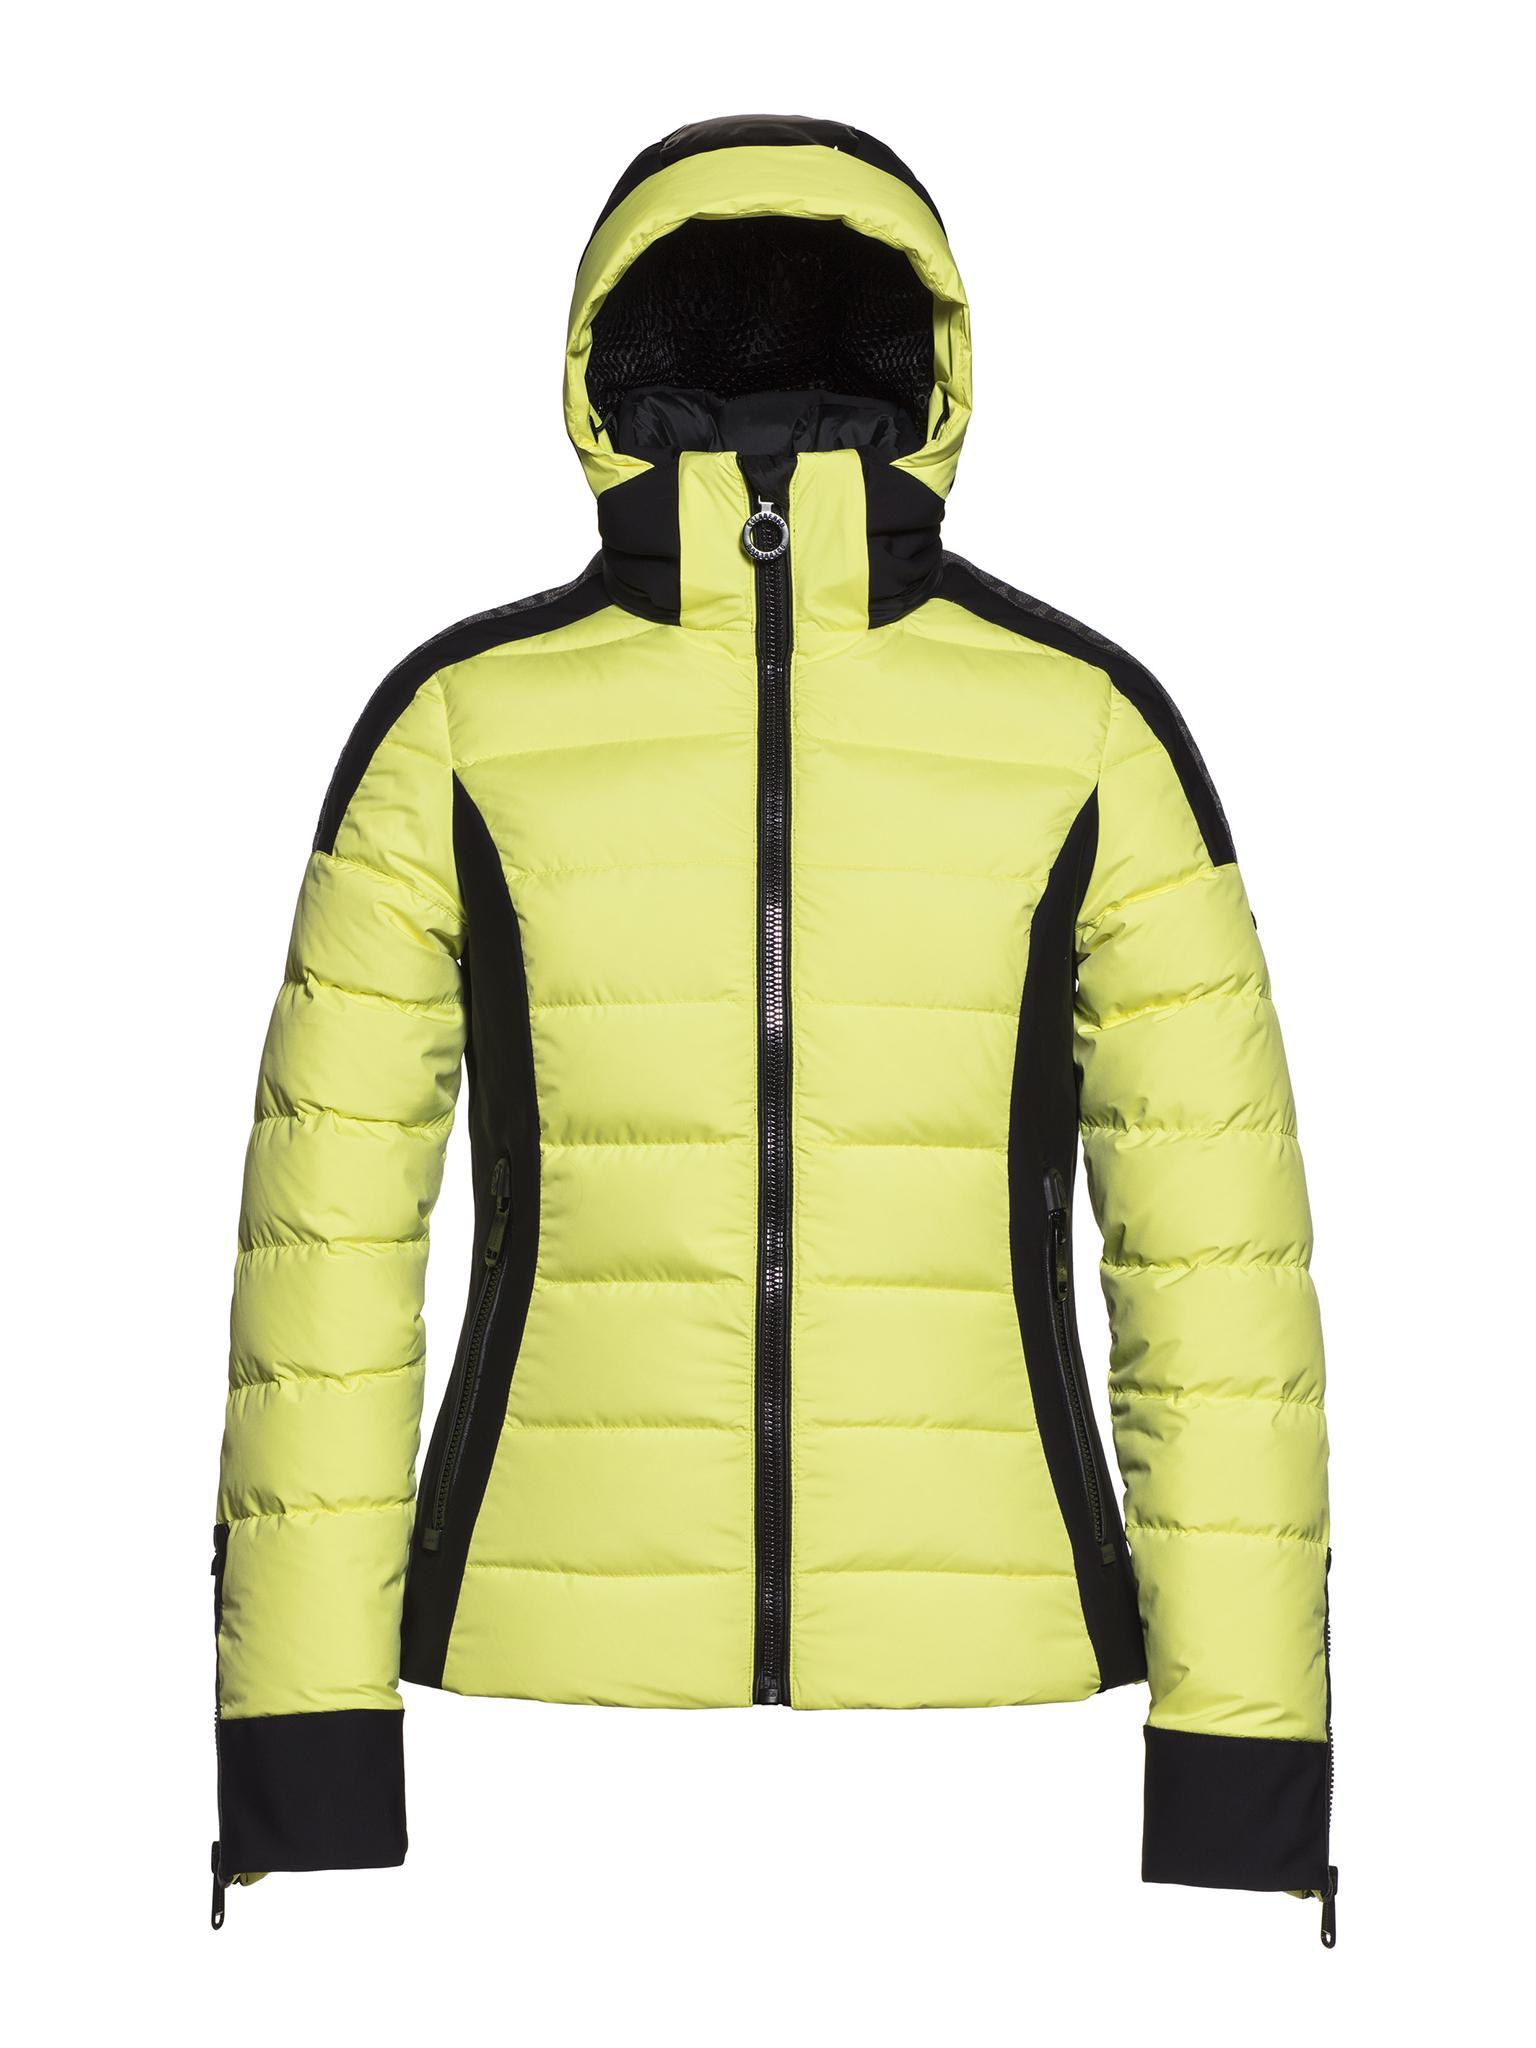 Neon gele dames winterjas Goldbergh - Almeta - GB02-10-193-104